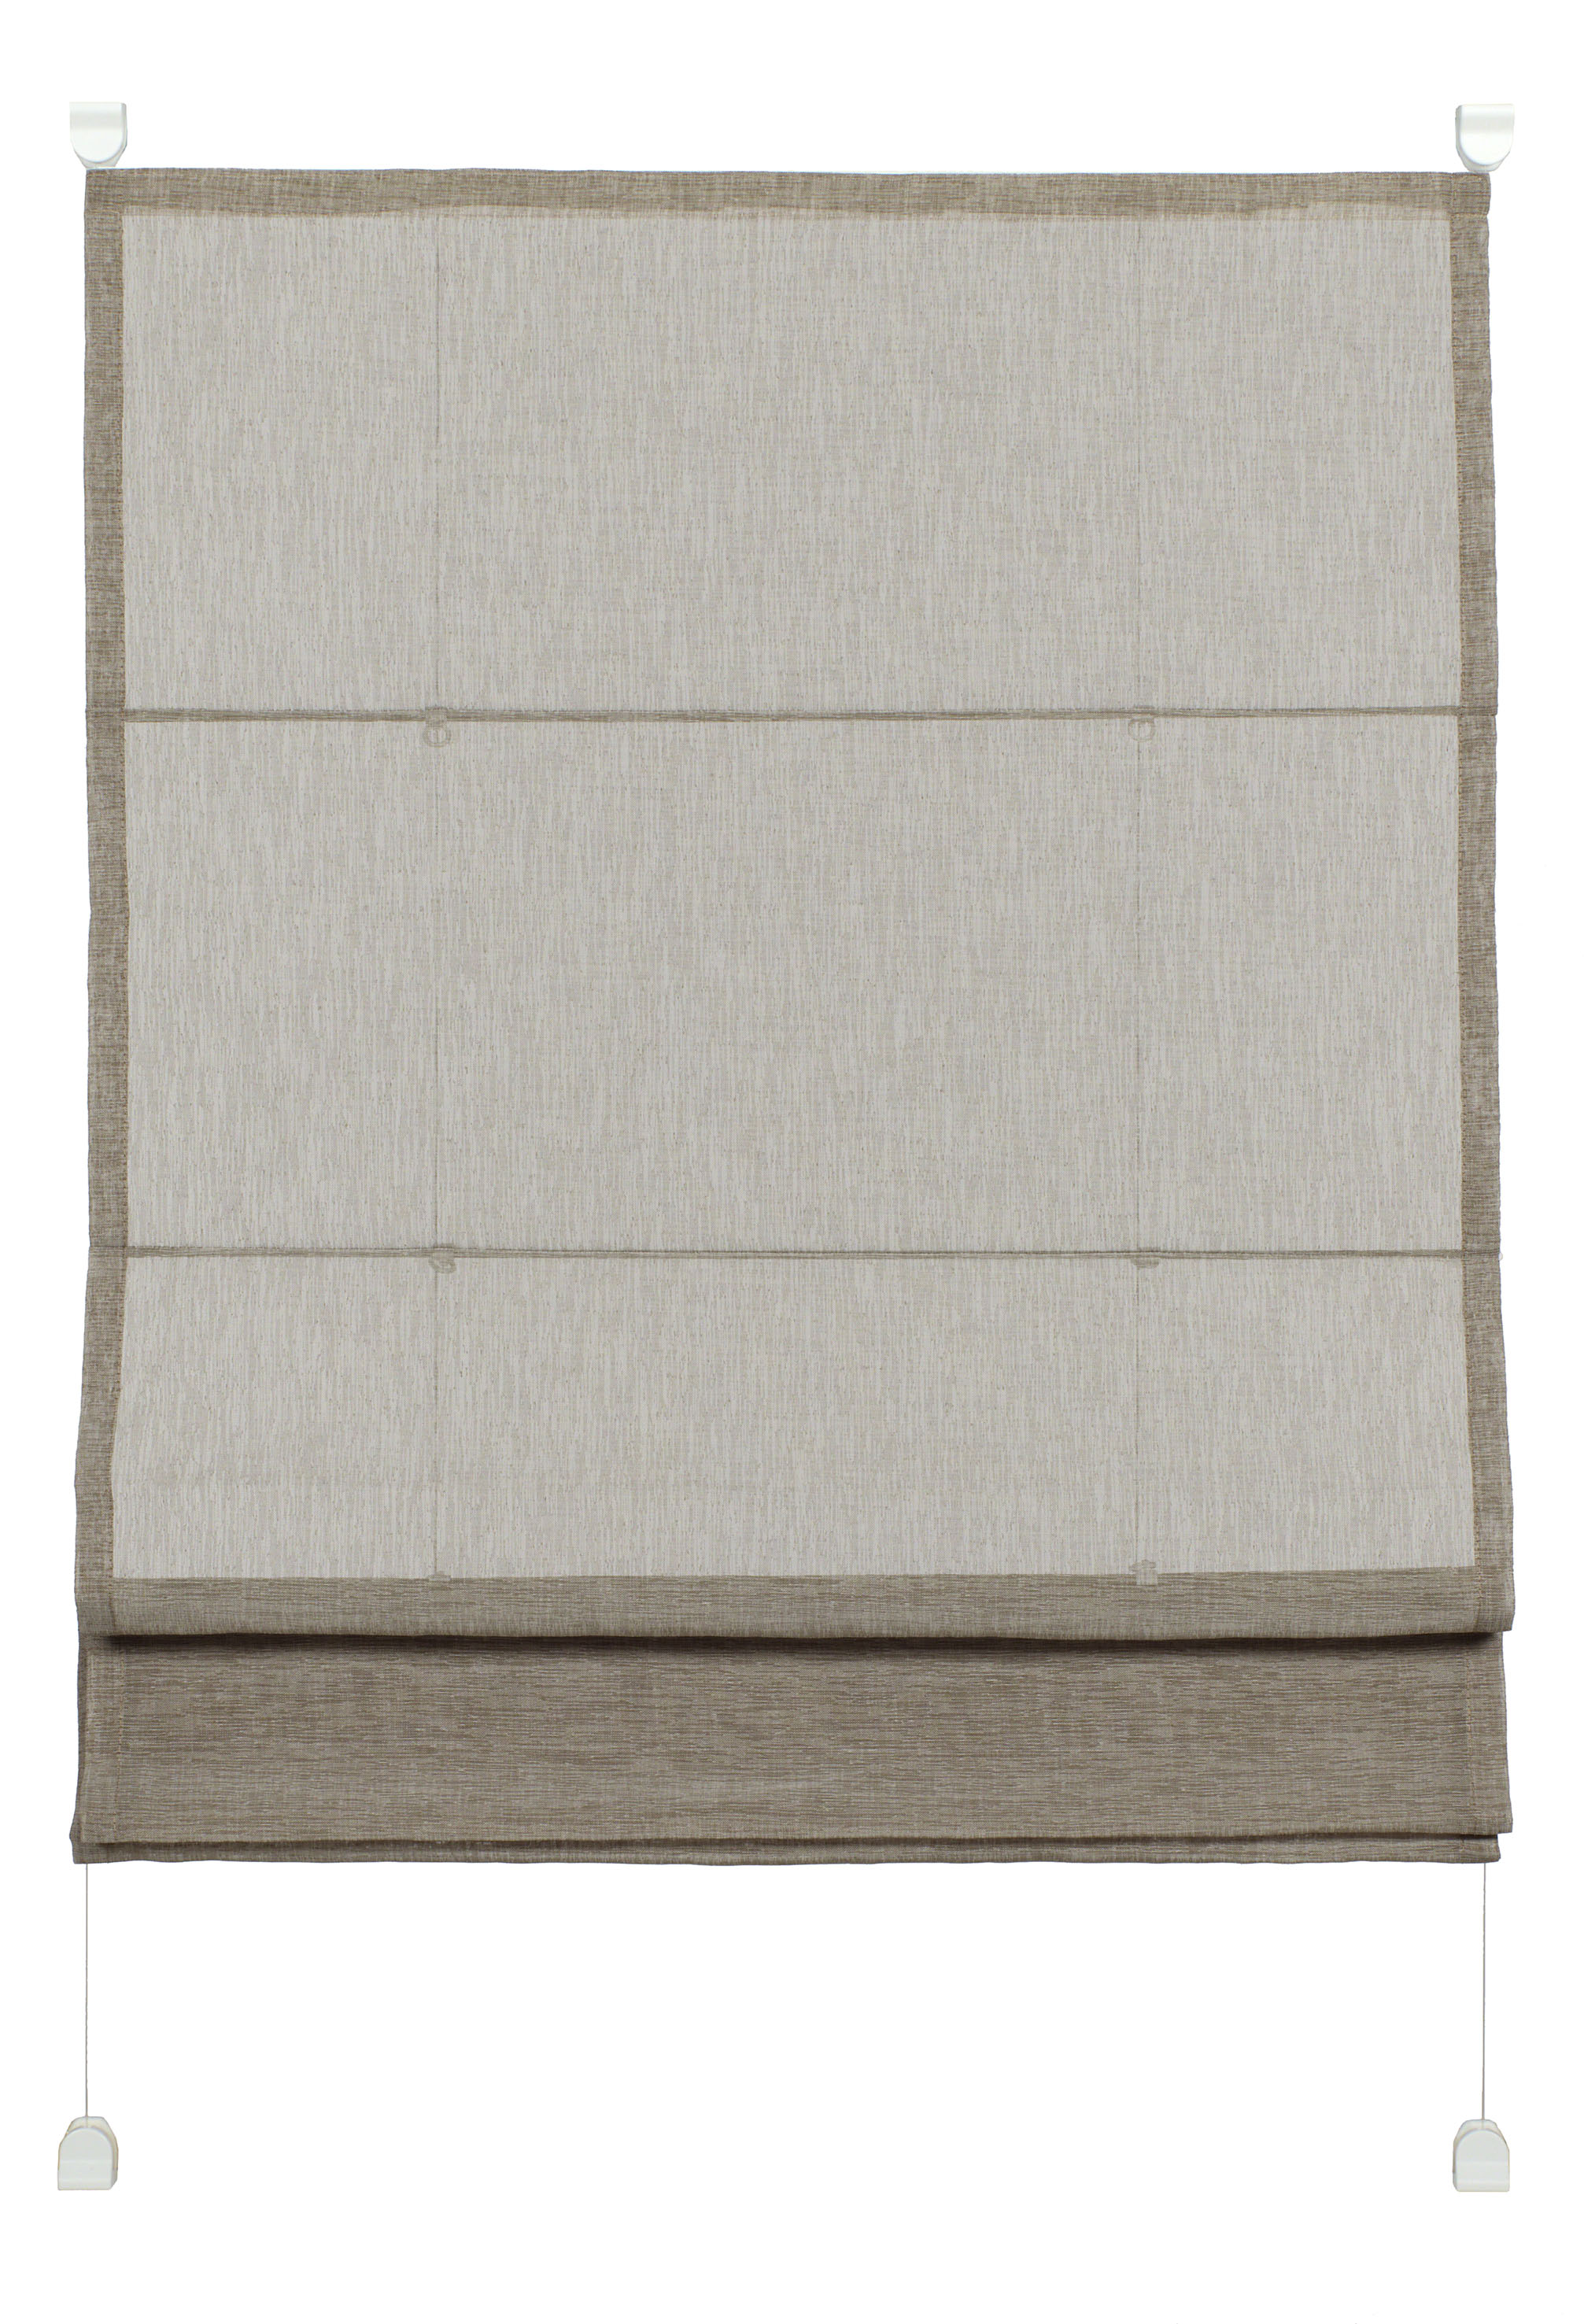 easyfix raffrollo transparent 70 x 140 cm kaffee 33928. Black Bedroom Furniture Sets. Home Design Ideas